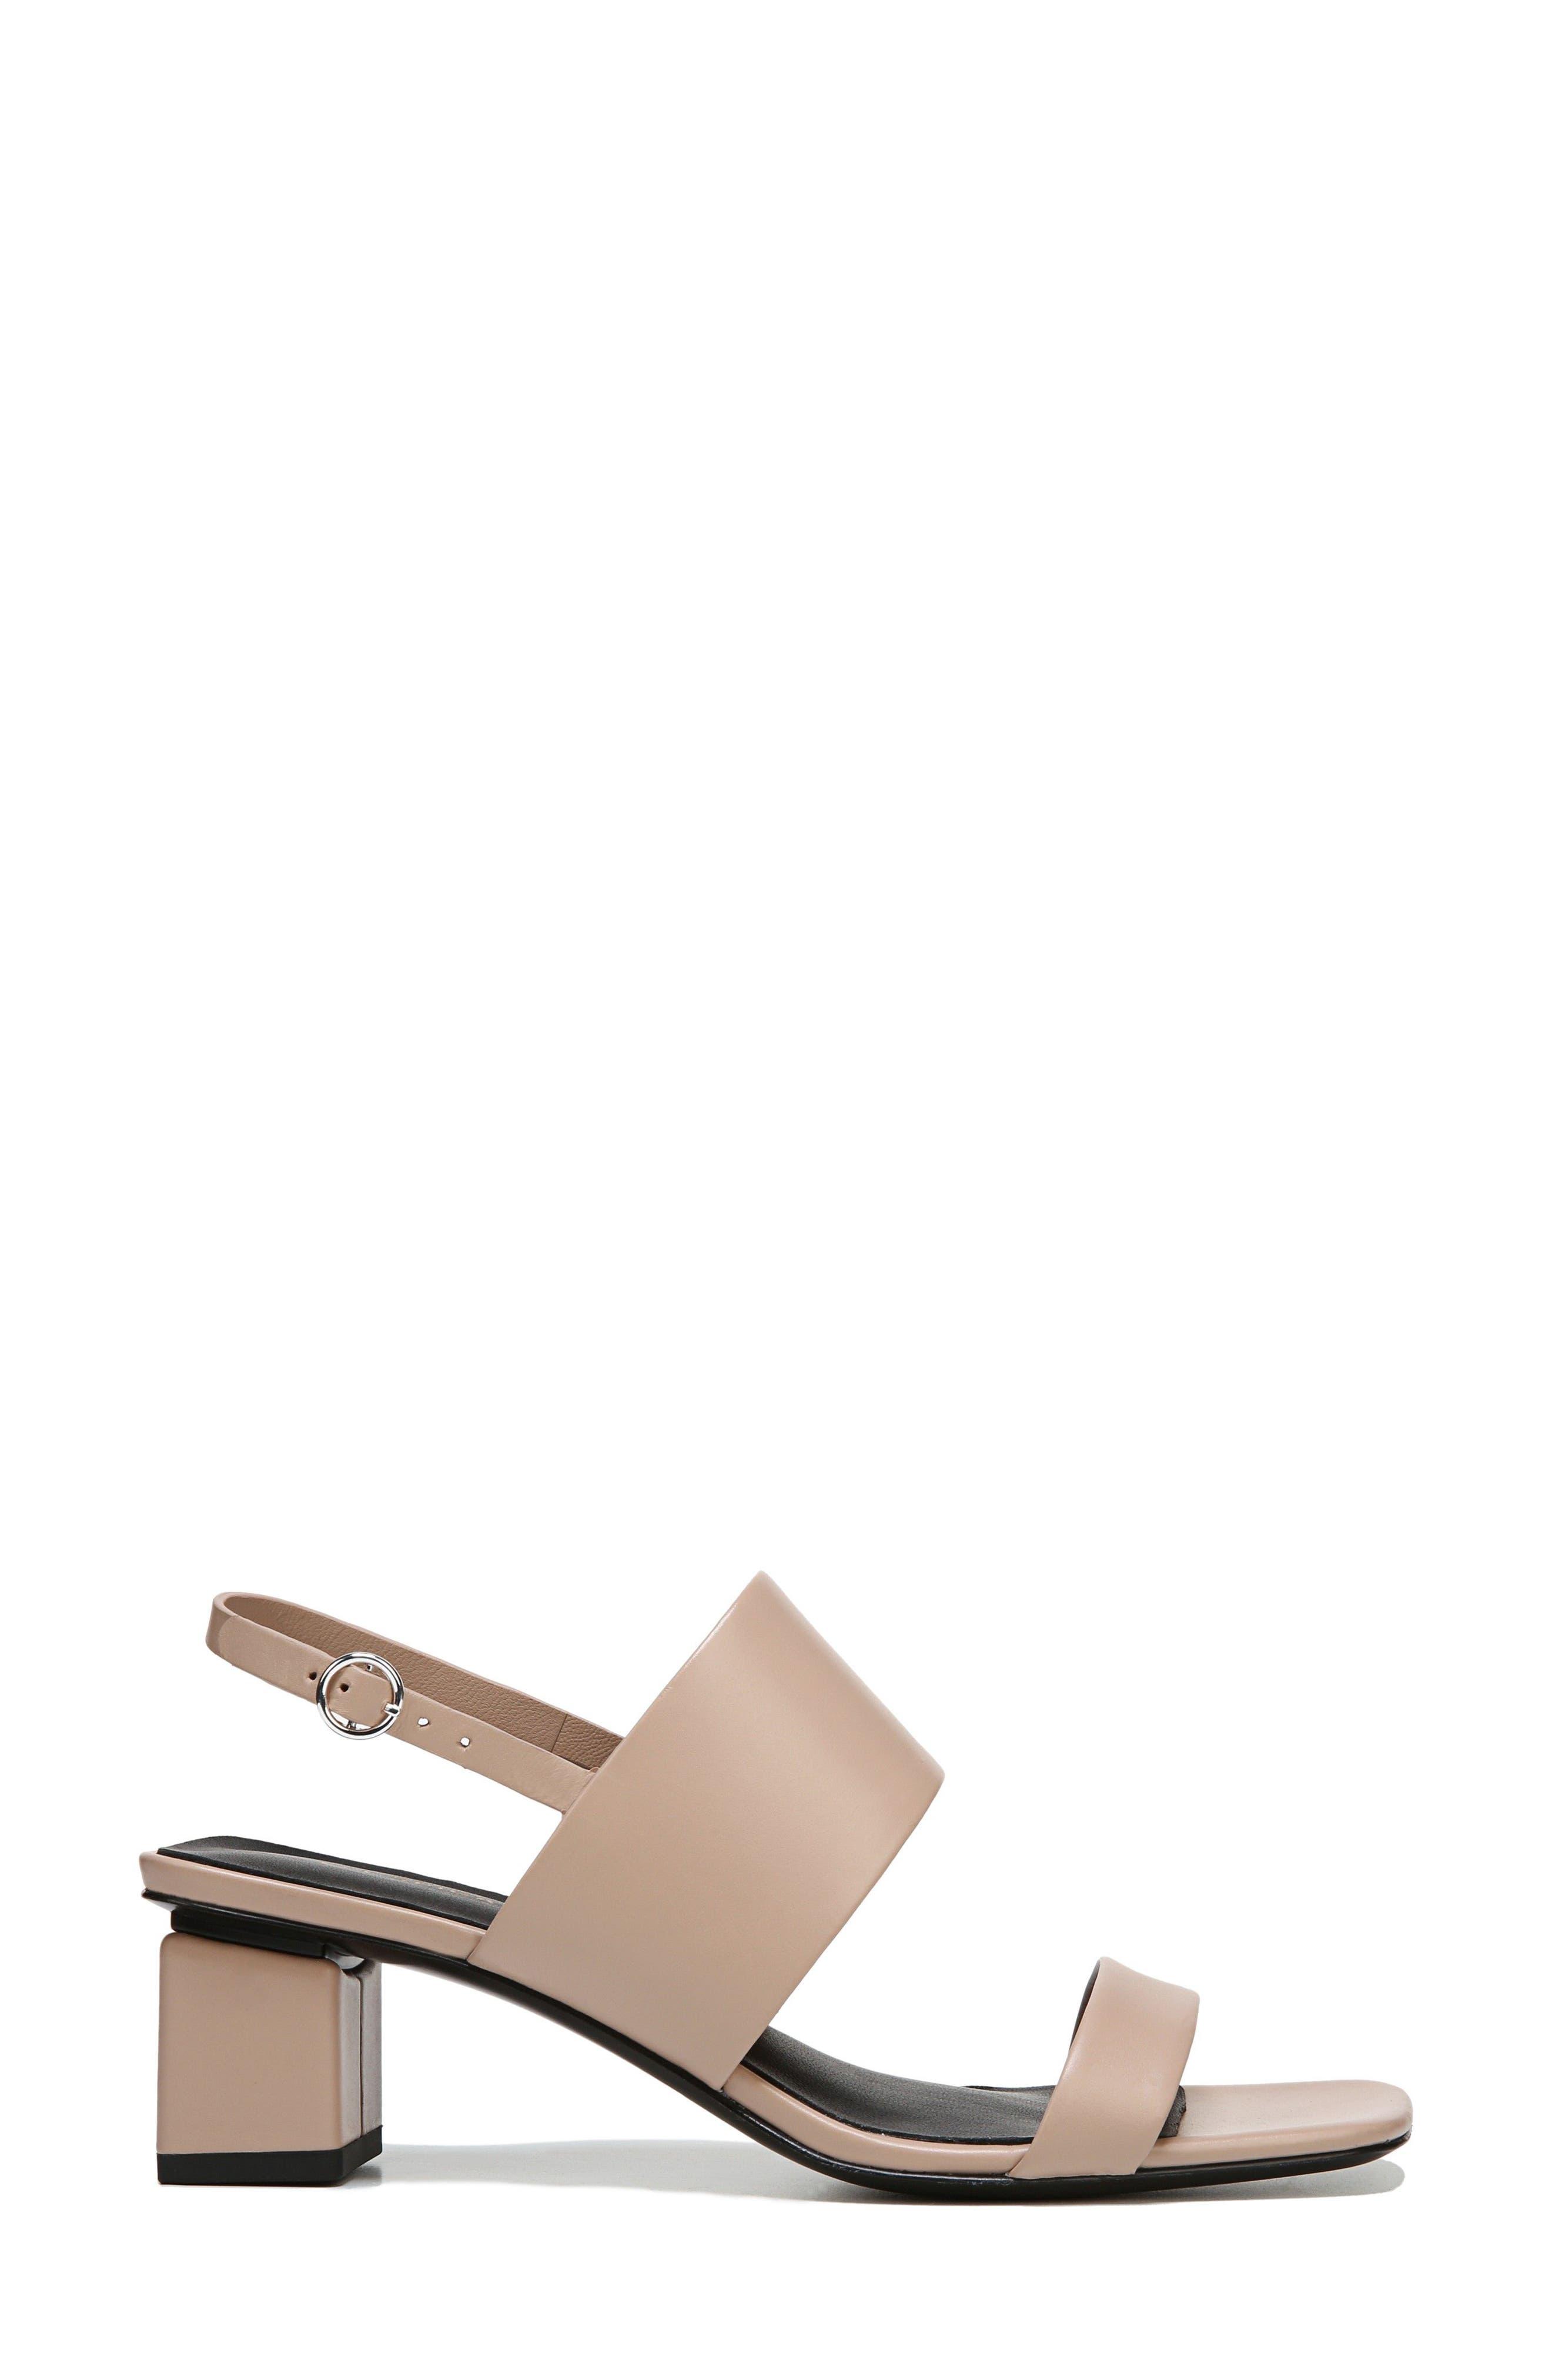 Forte Block Heel Sandal,                             Alternate thumbnail 3, color,                             Sand Patent